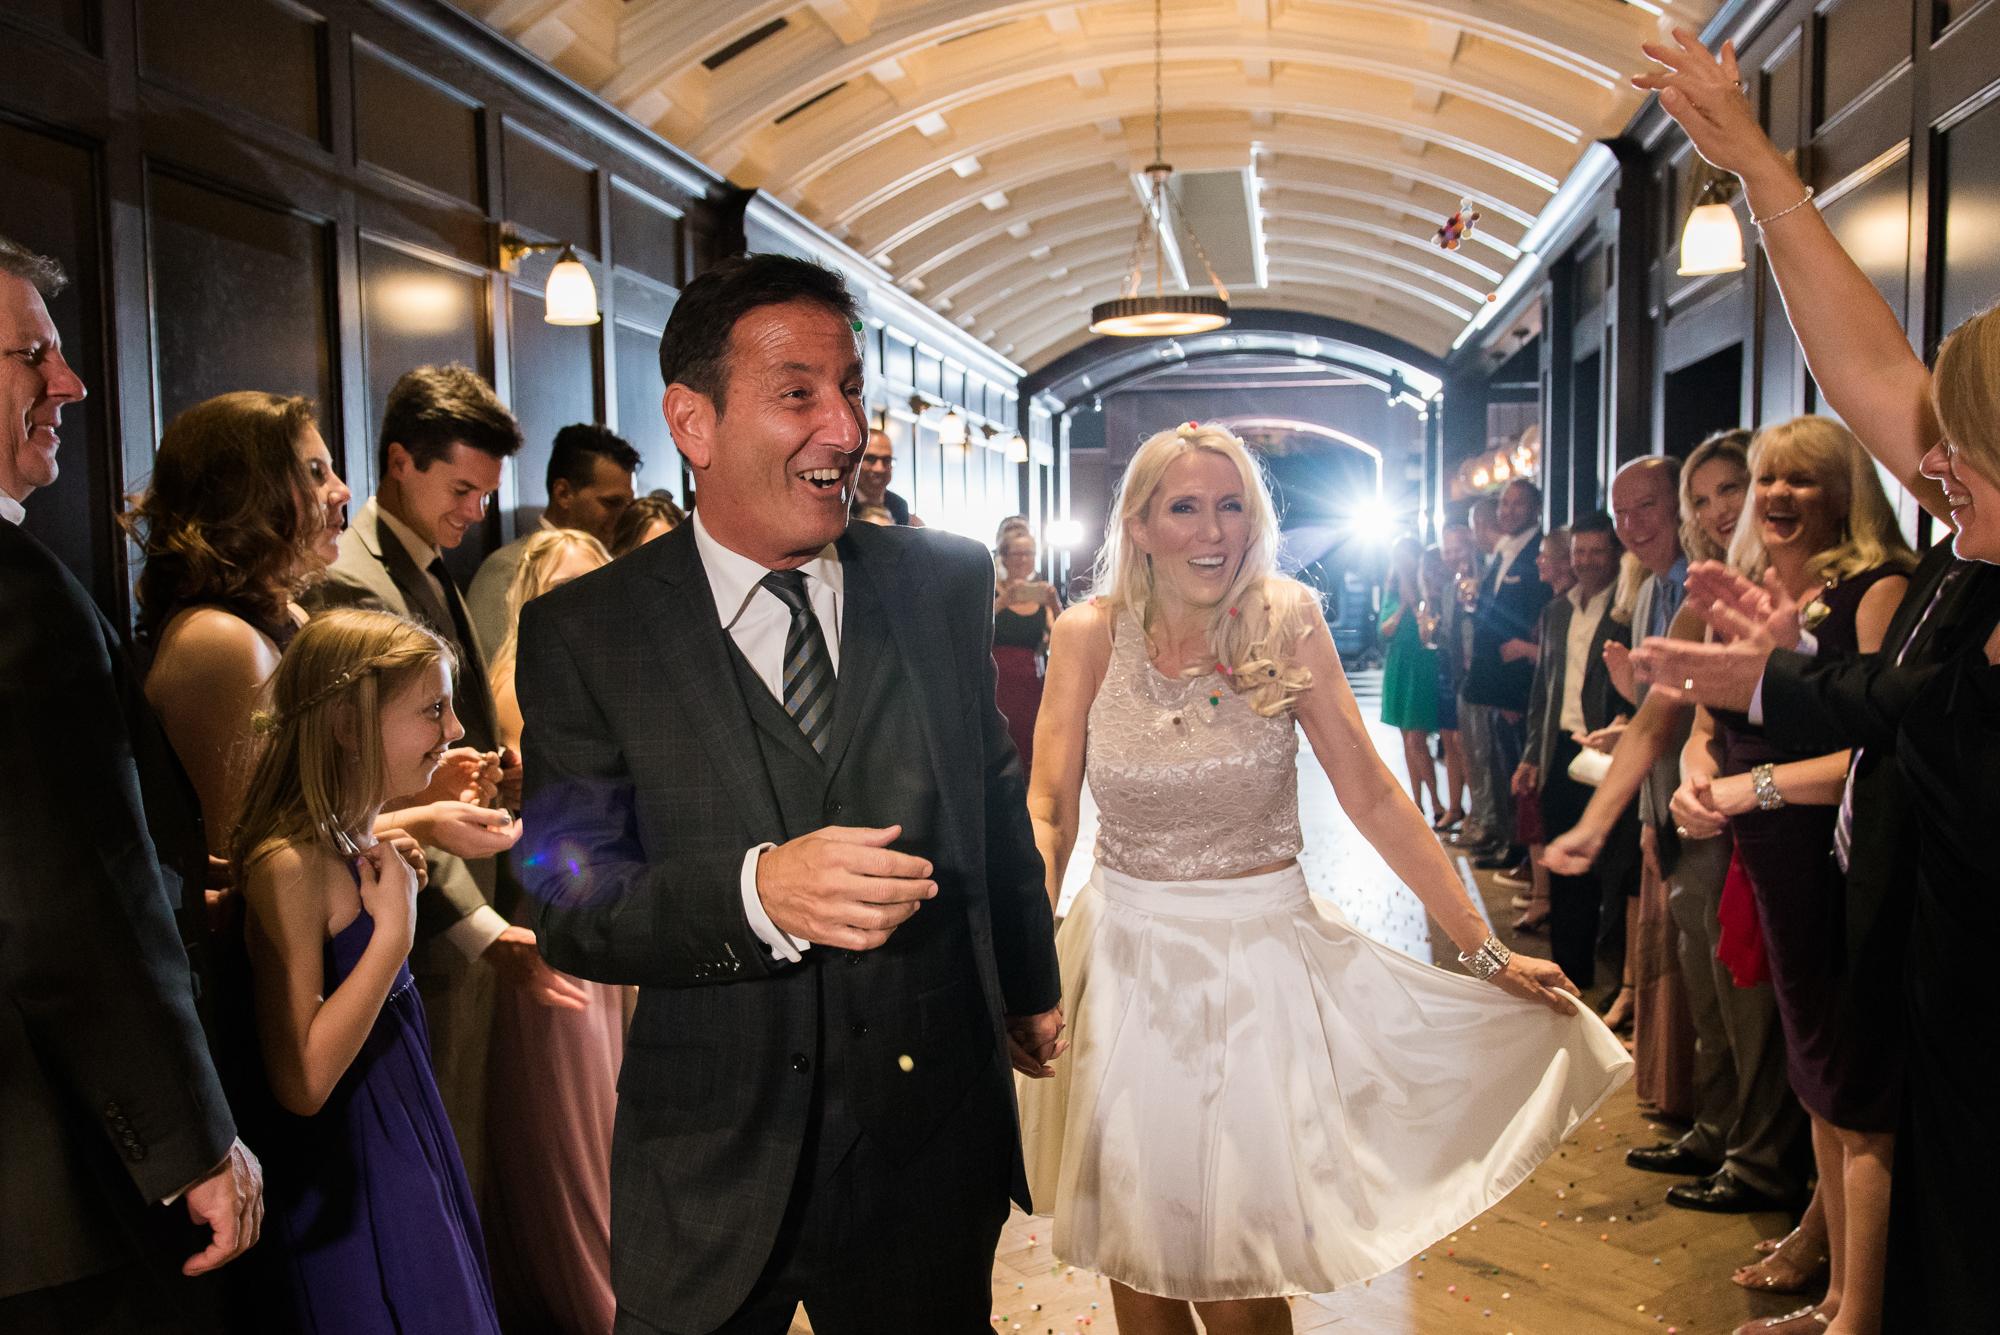 Oxford-Exchange-wedding-exit-photography